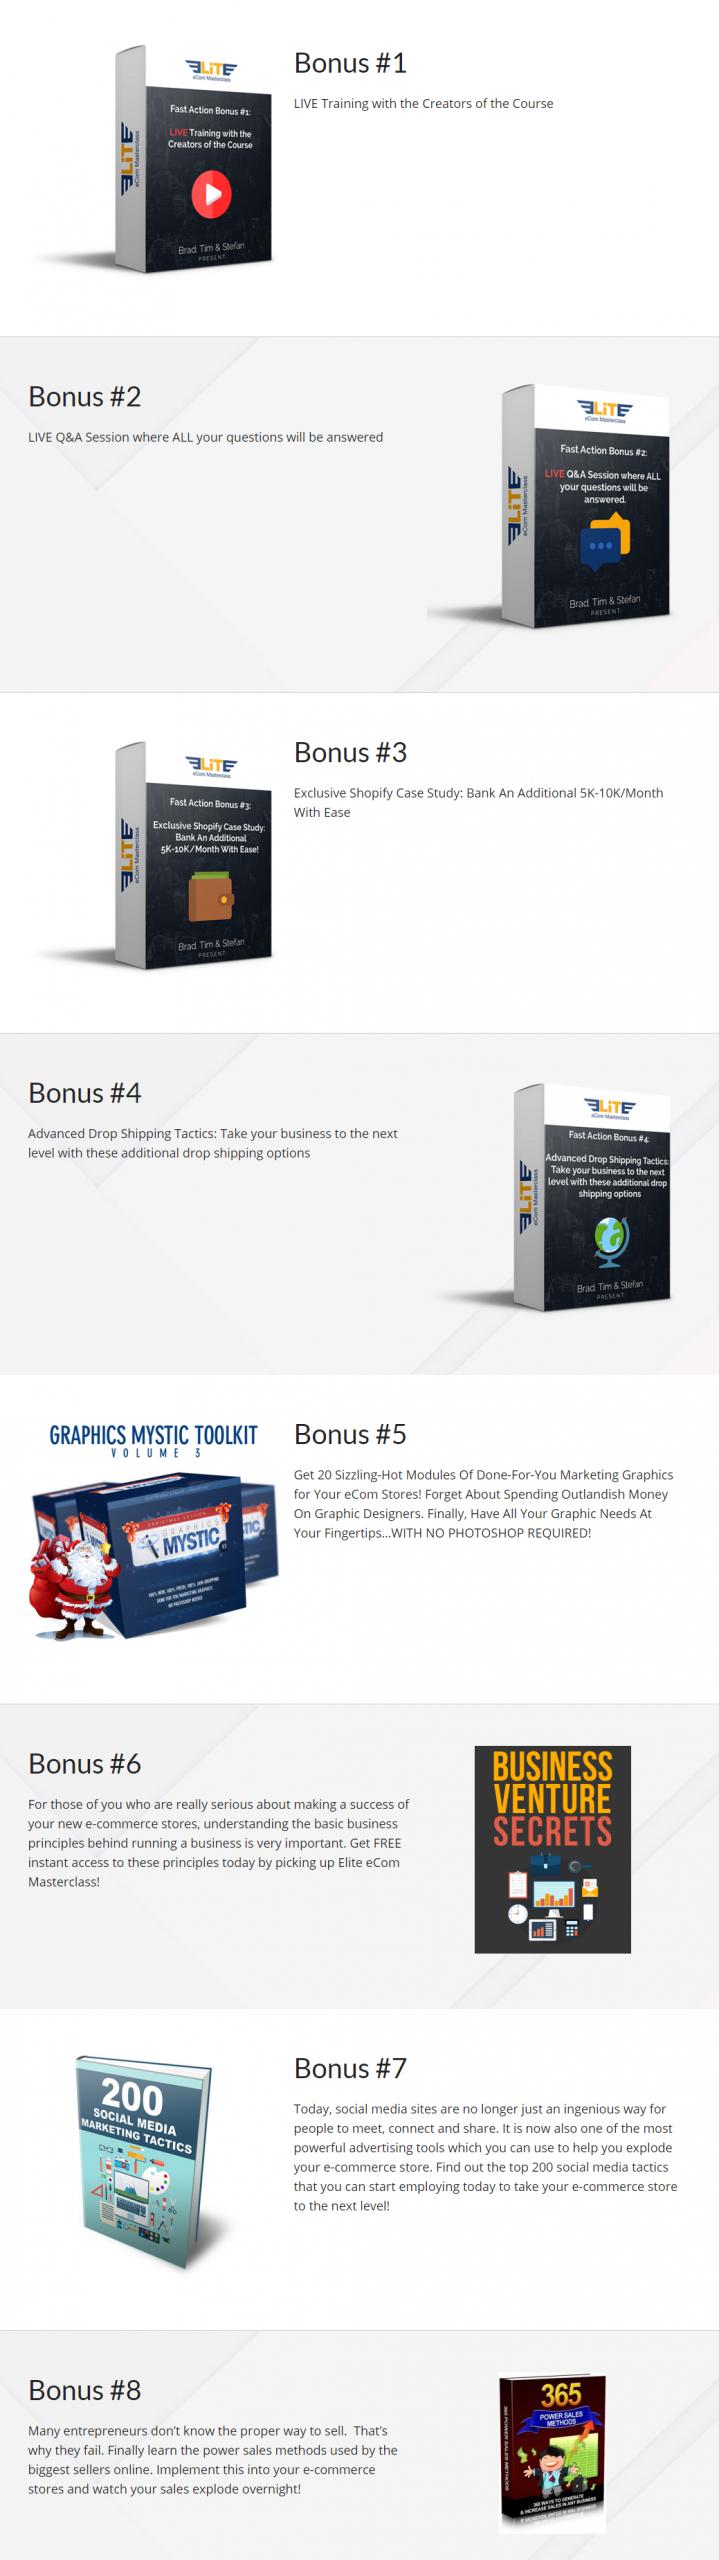 Elite eCom Masterclass bonus